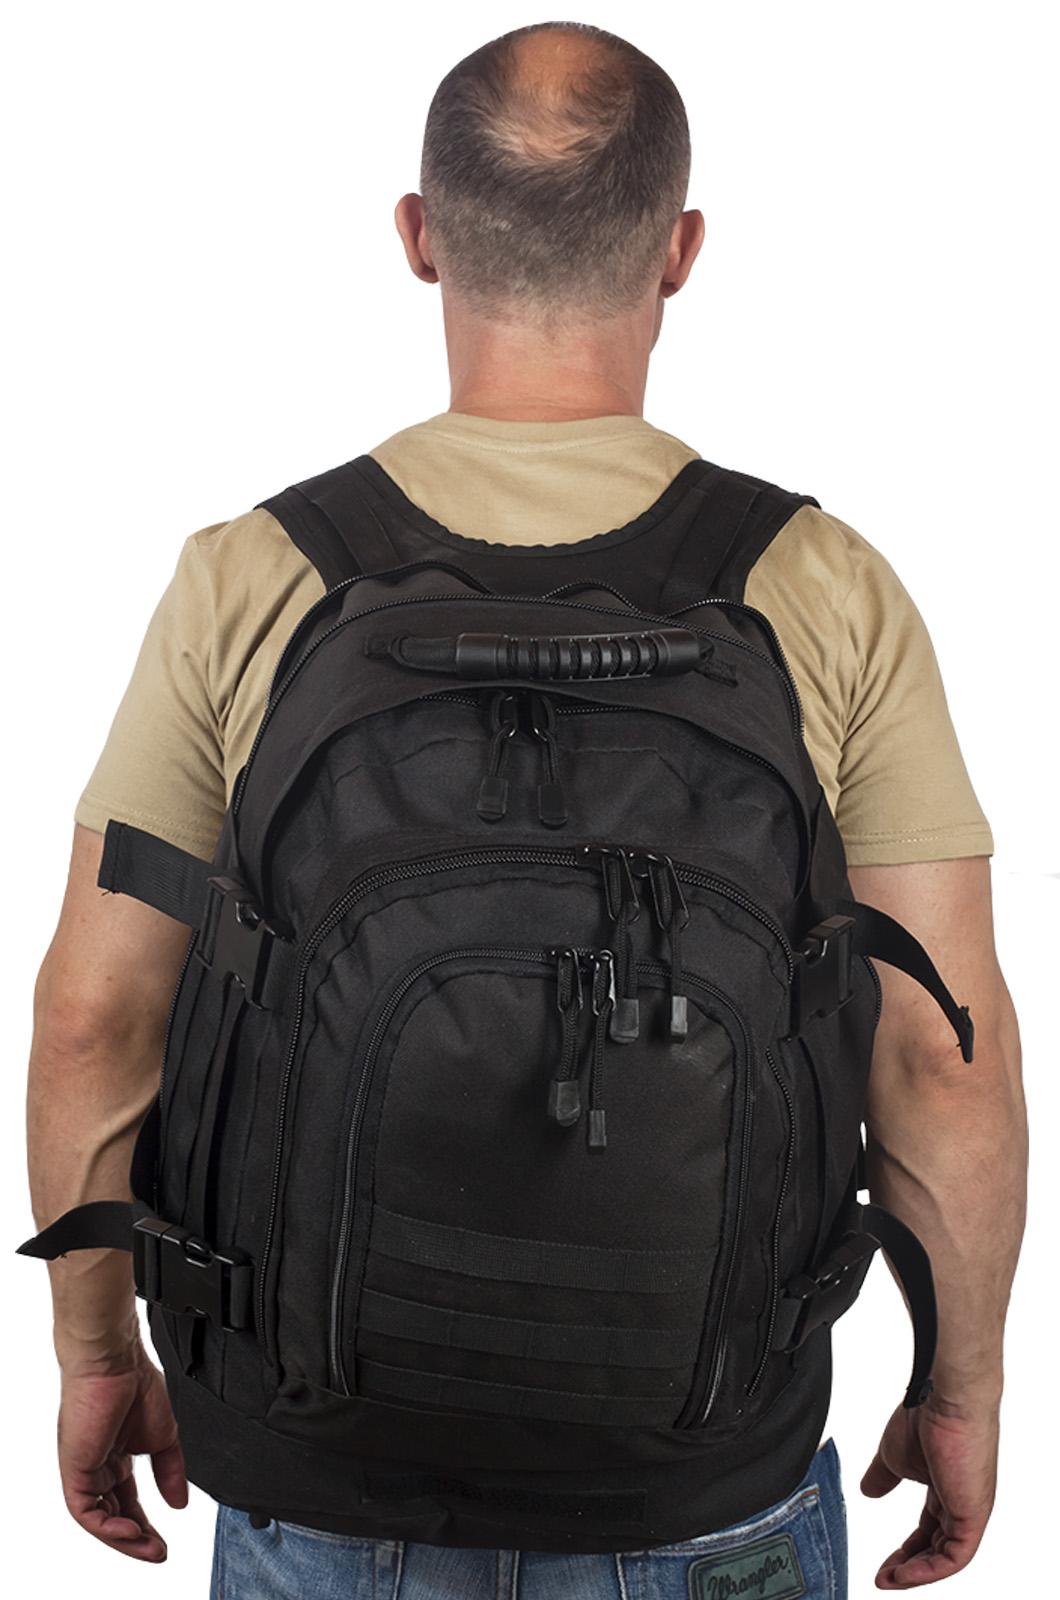 Купить черный армейский рюкзак 3-Day Expandable Backpack 08002A Black